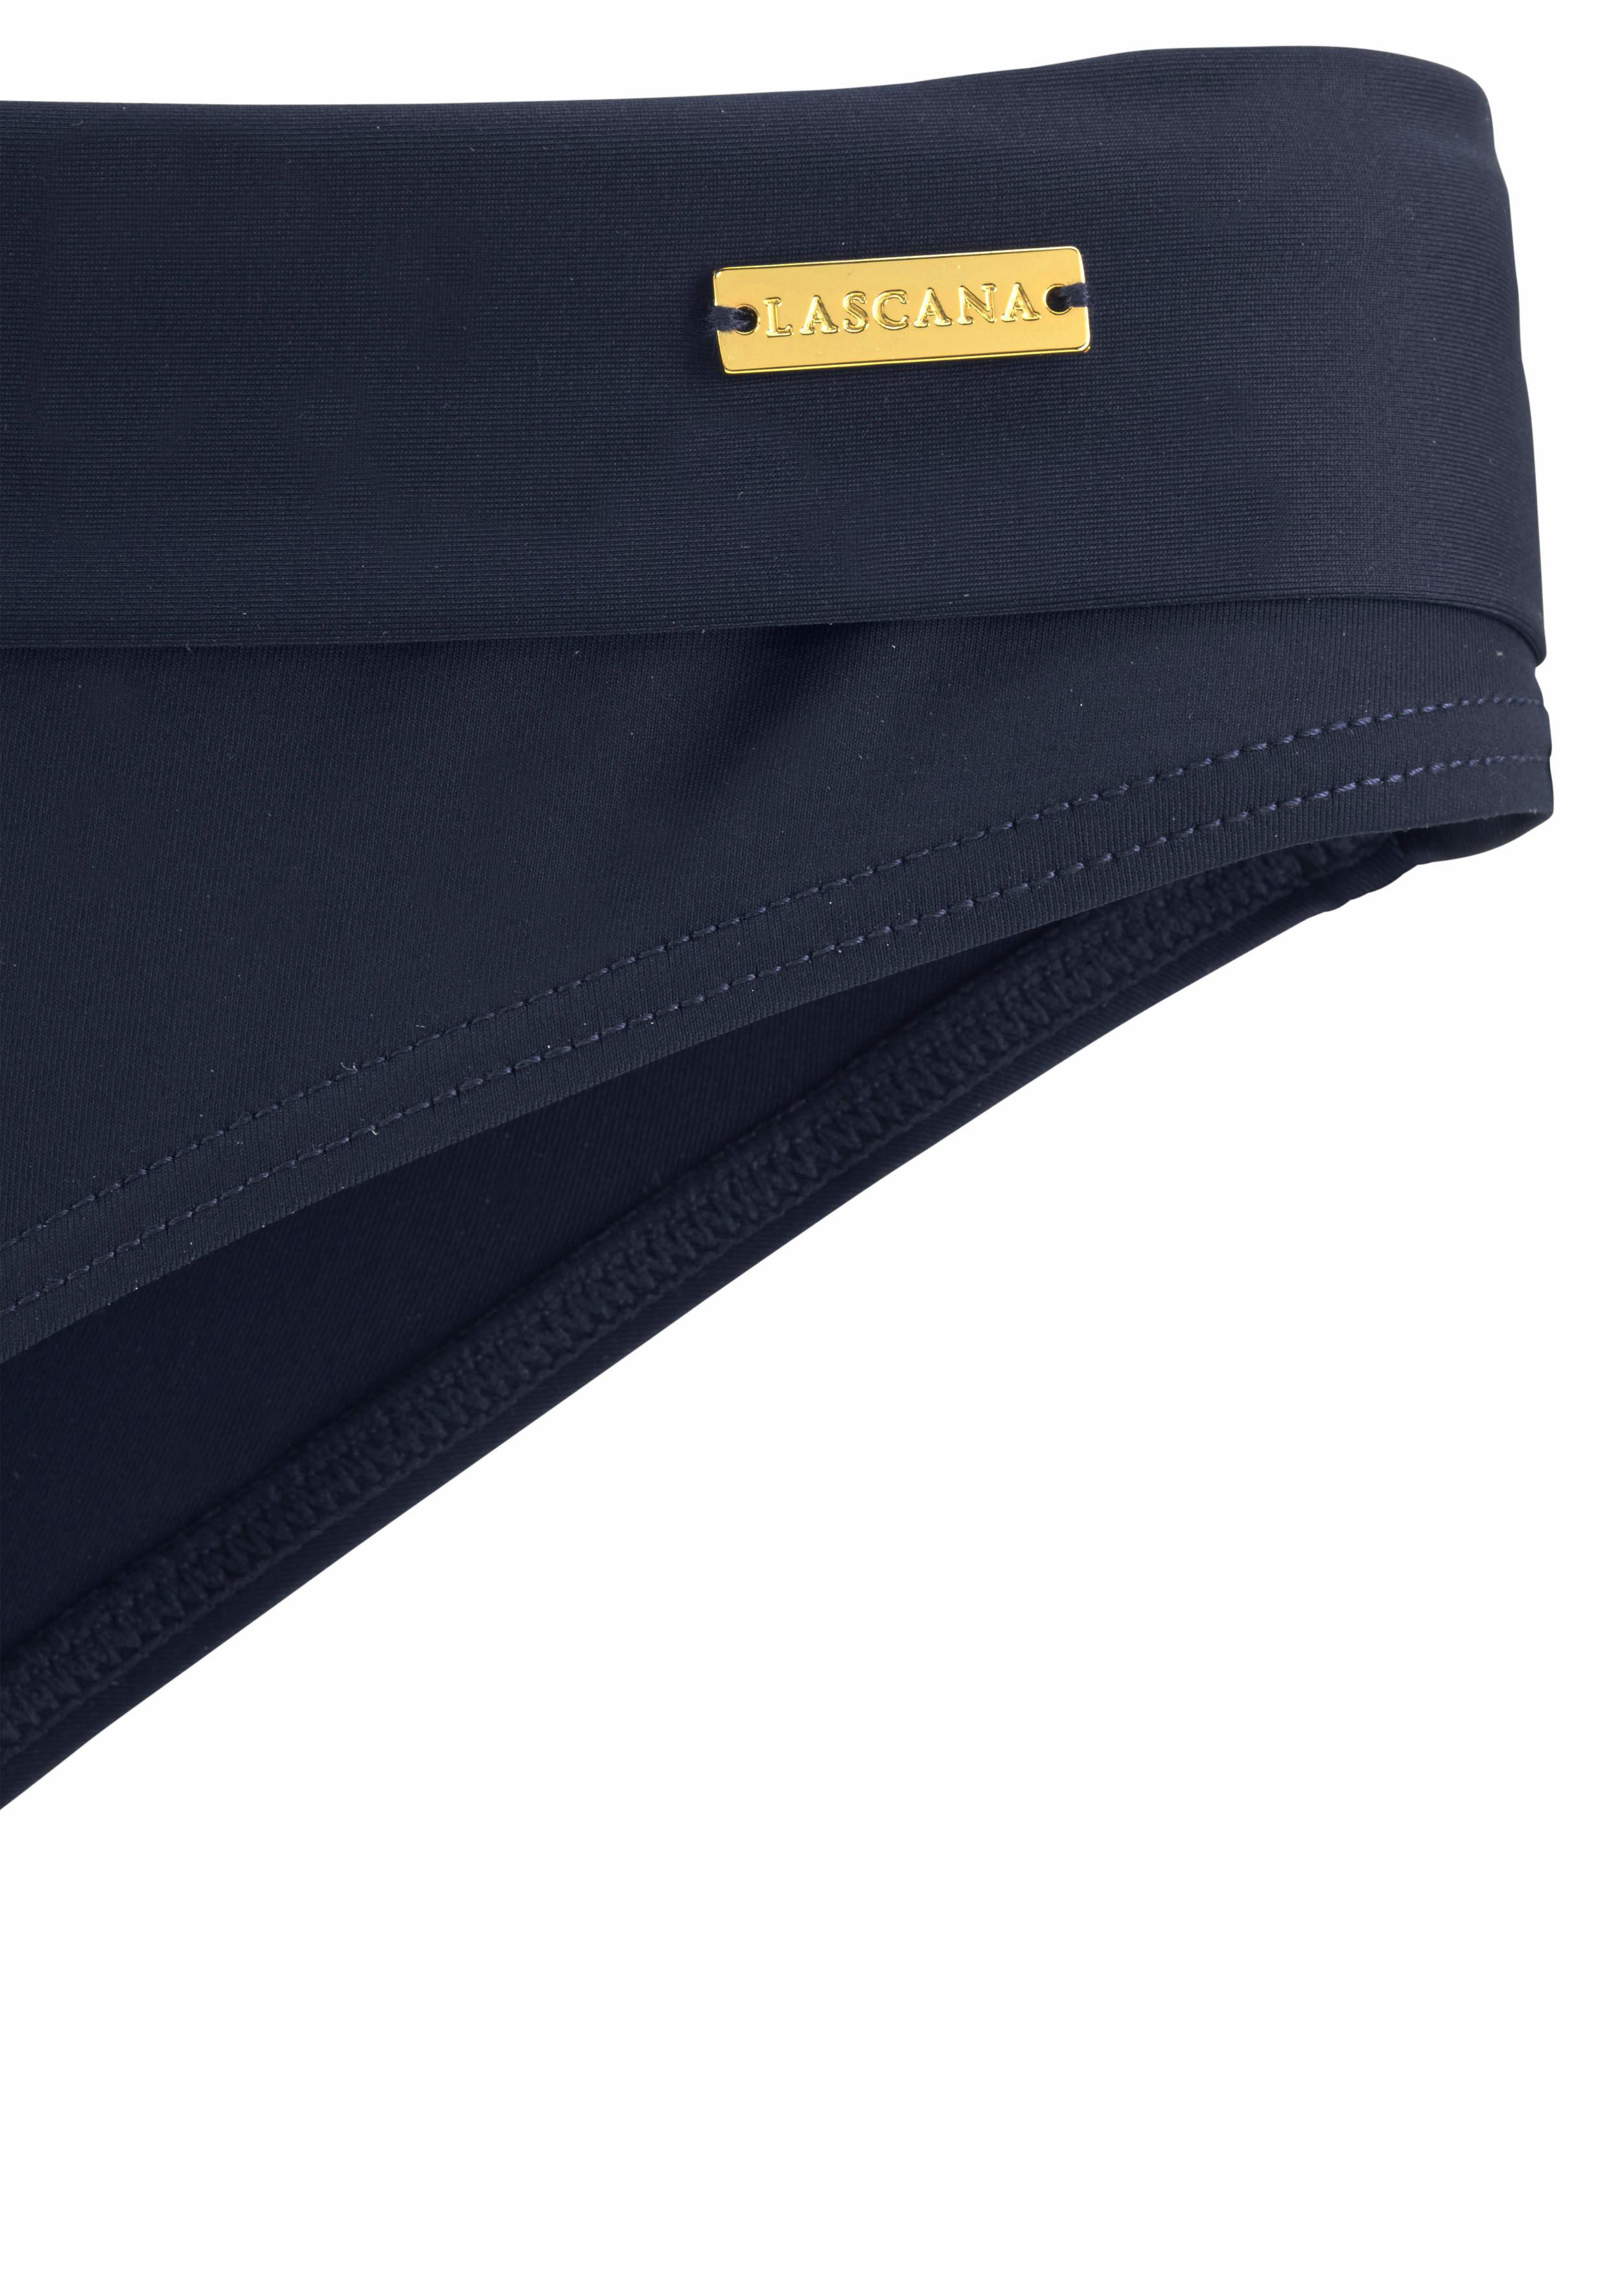 LASCANA Bikini-Hose »Italy« mit Umschlagbund